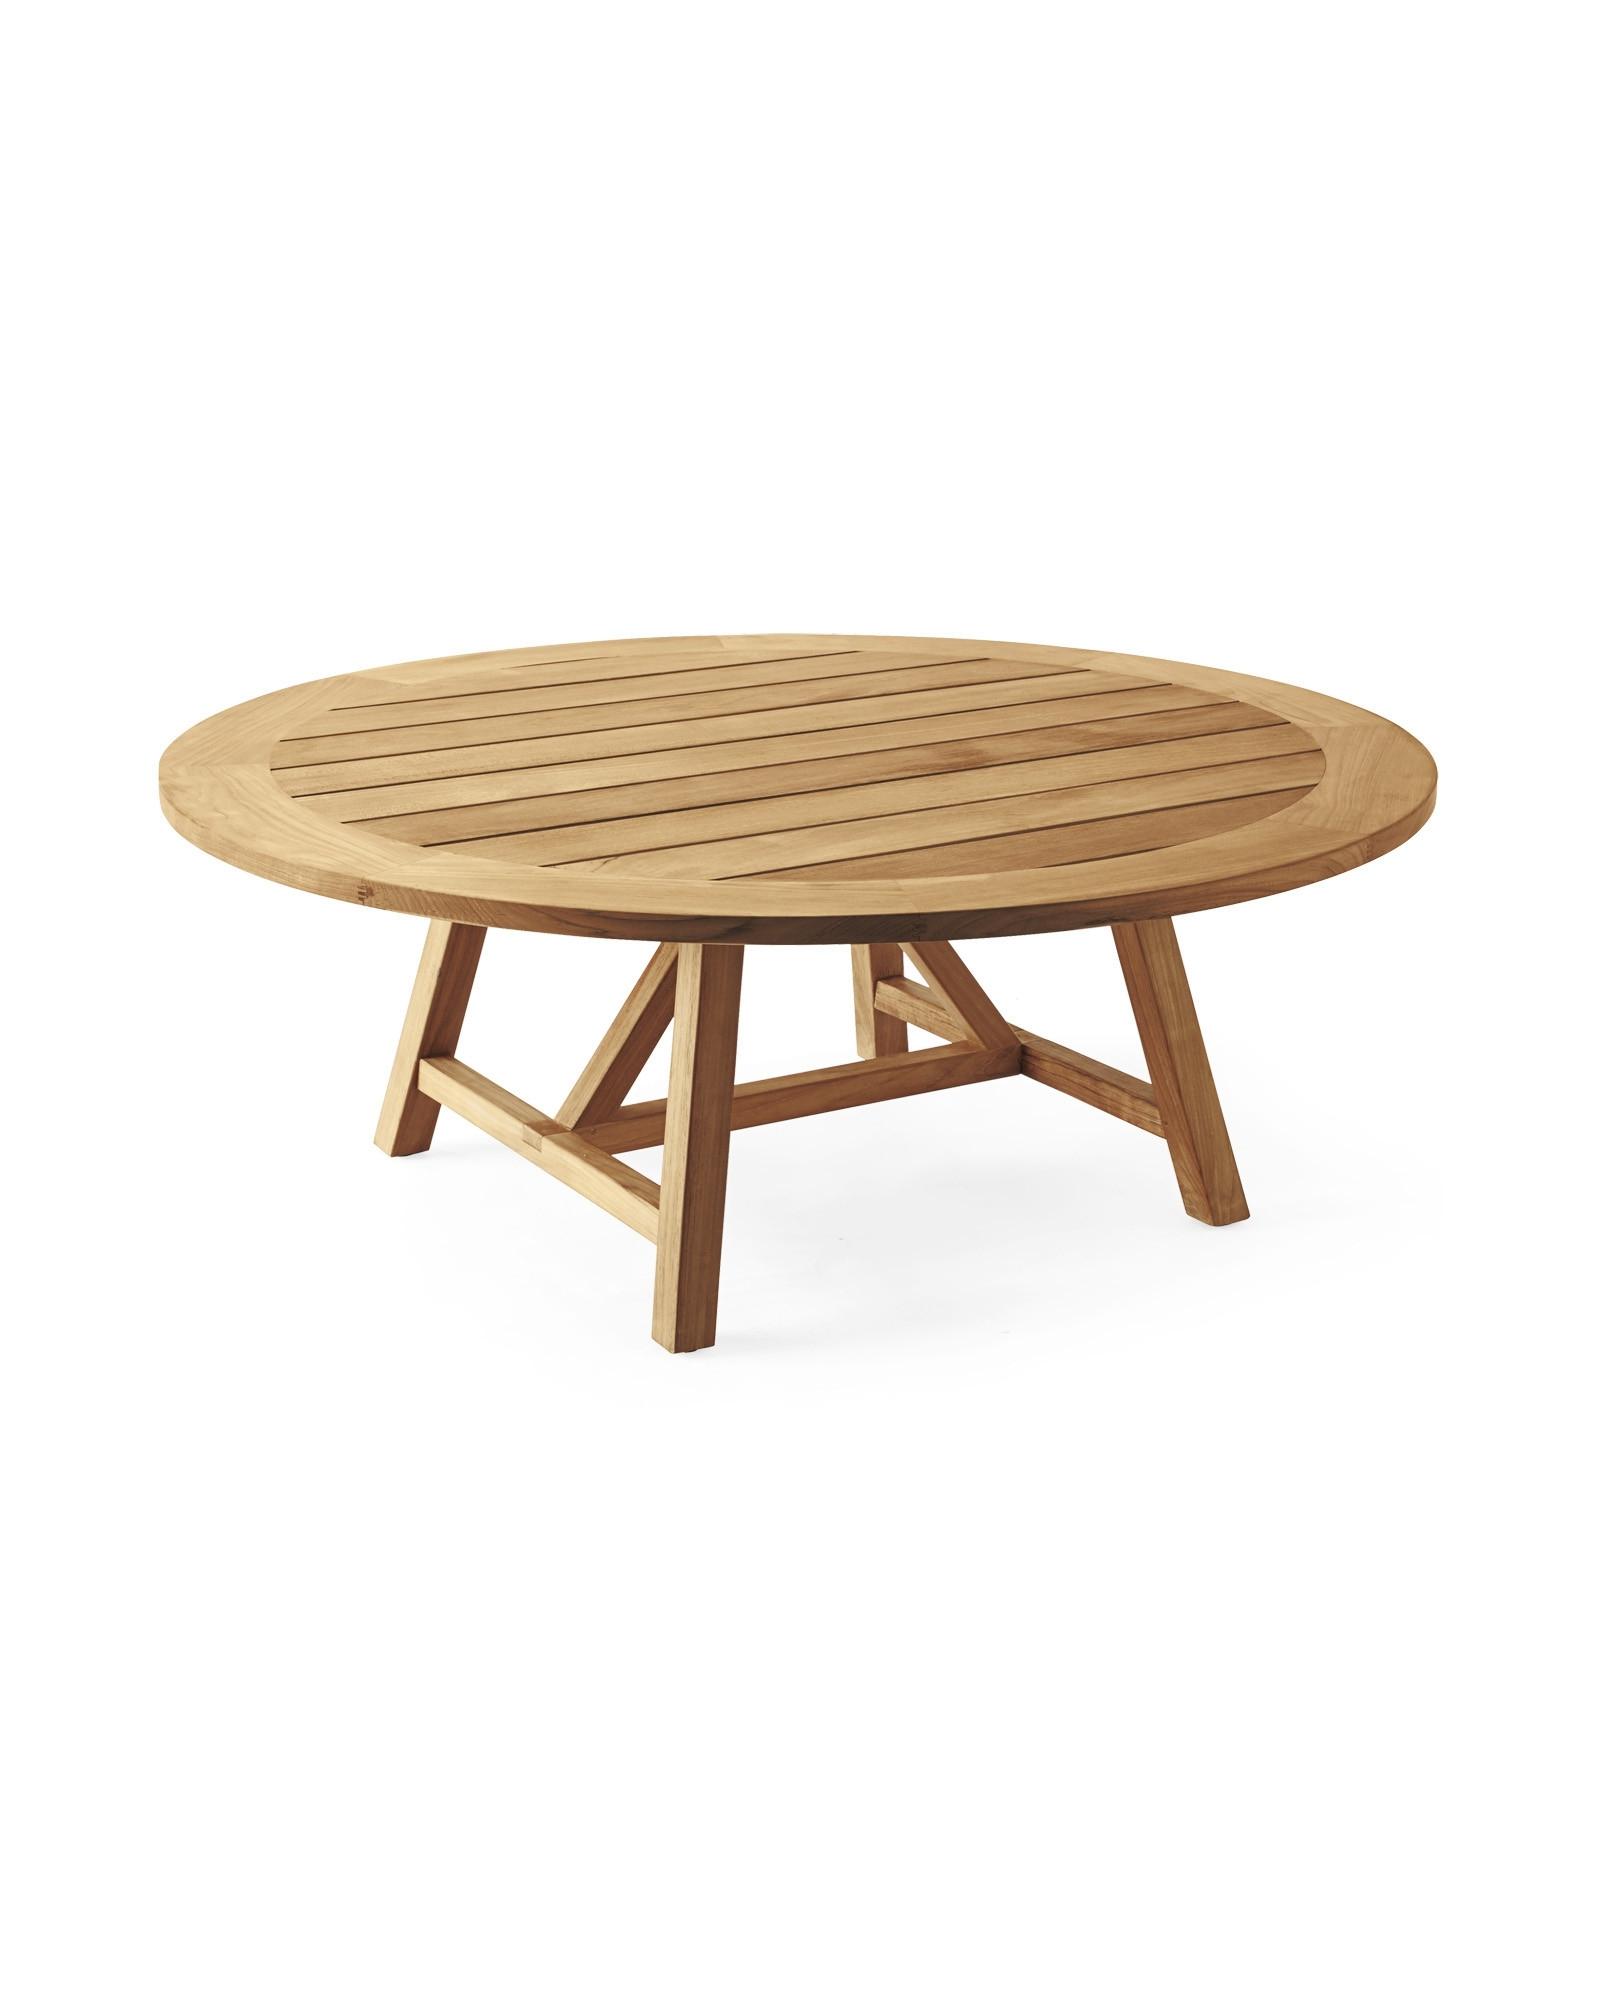 Teak Coffee Table Outdoor Fresh Round Teak Coffee Table intended for Round Teak Coffee Tables (Image 25 of 30)